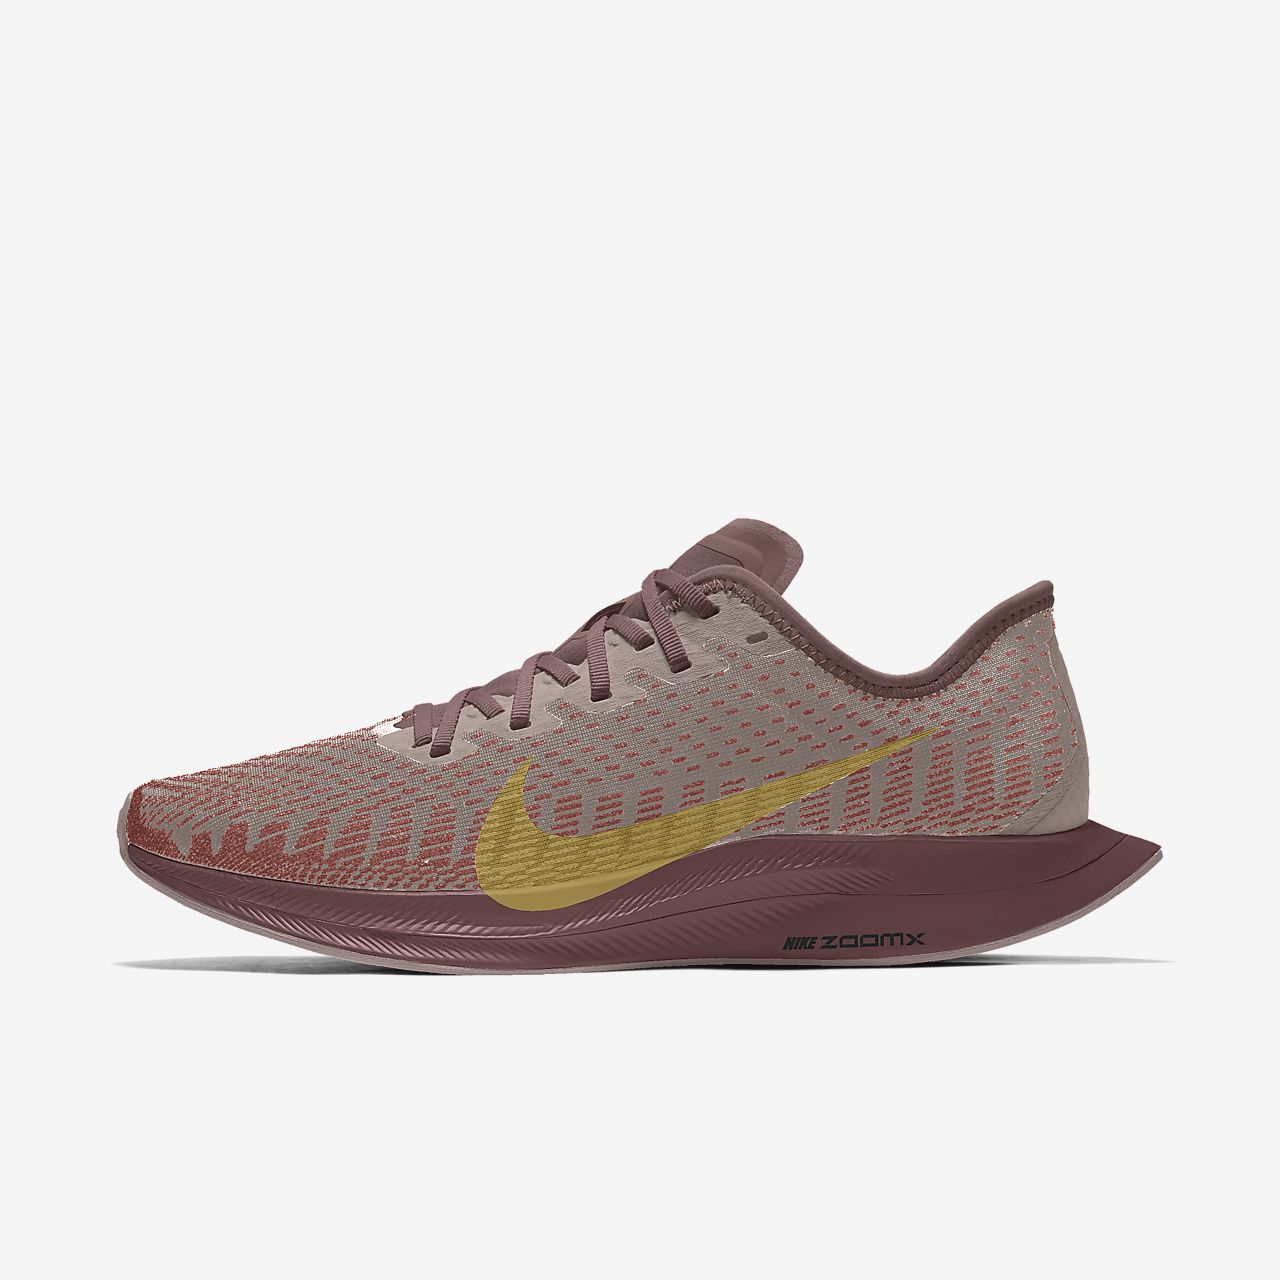 Nike Zoom Pegasus Turbo 2 Premium By You Zapatillas de running personalizables - Mujer